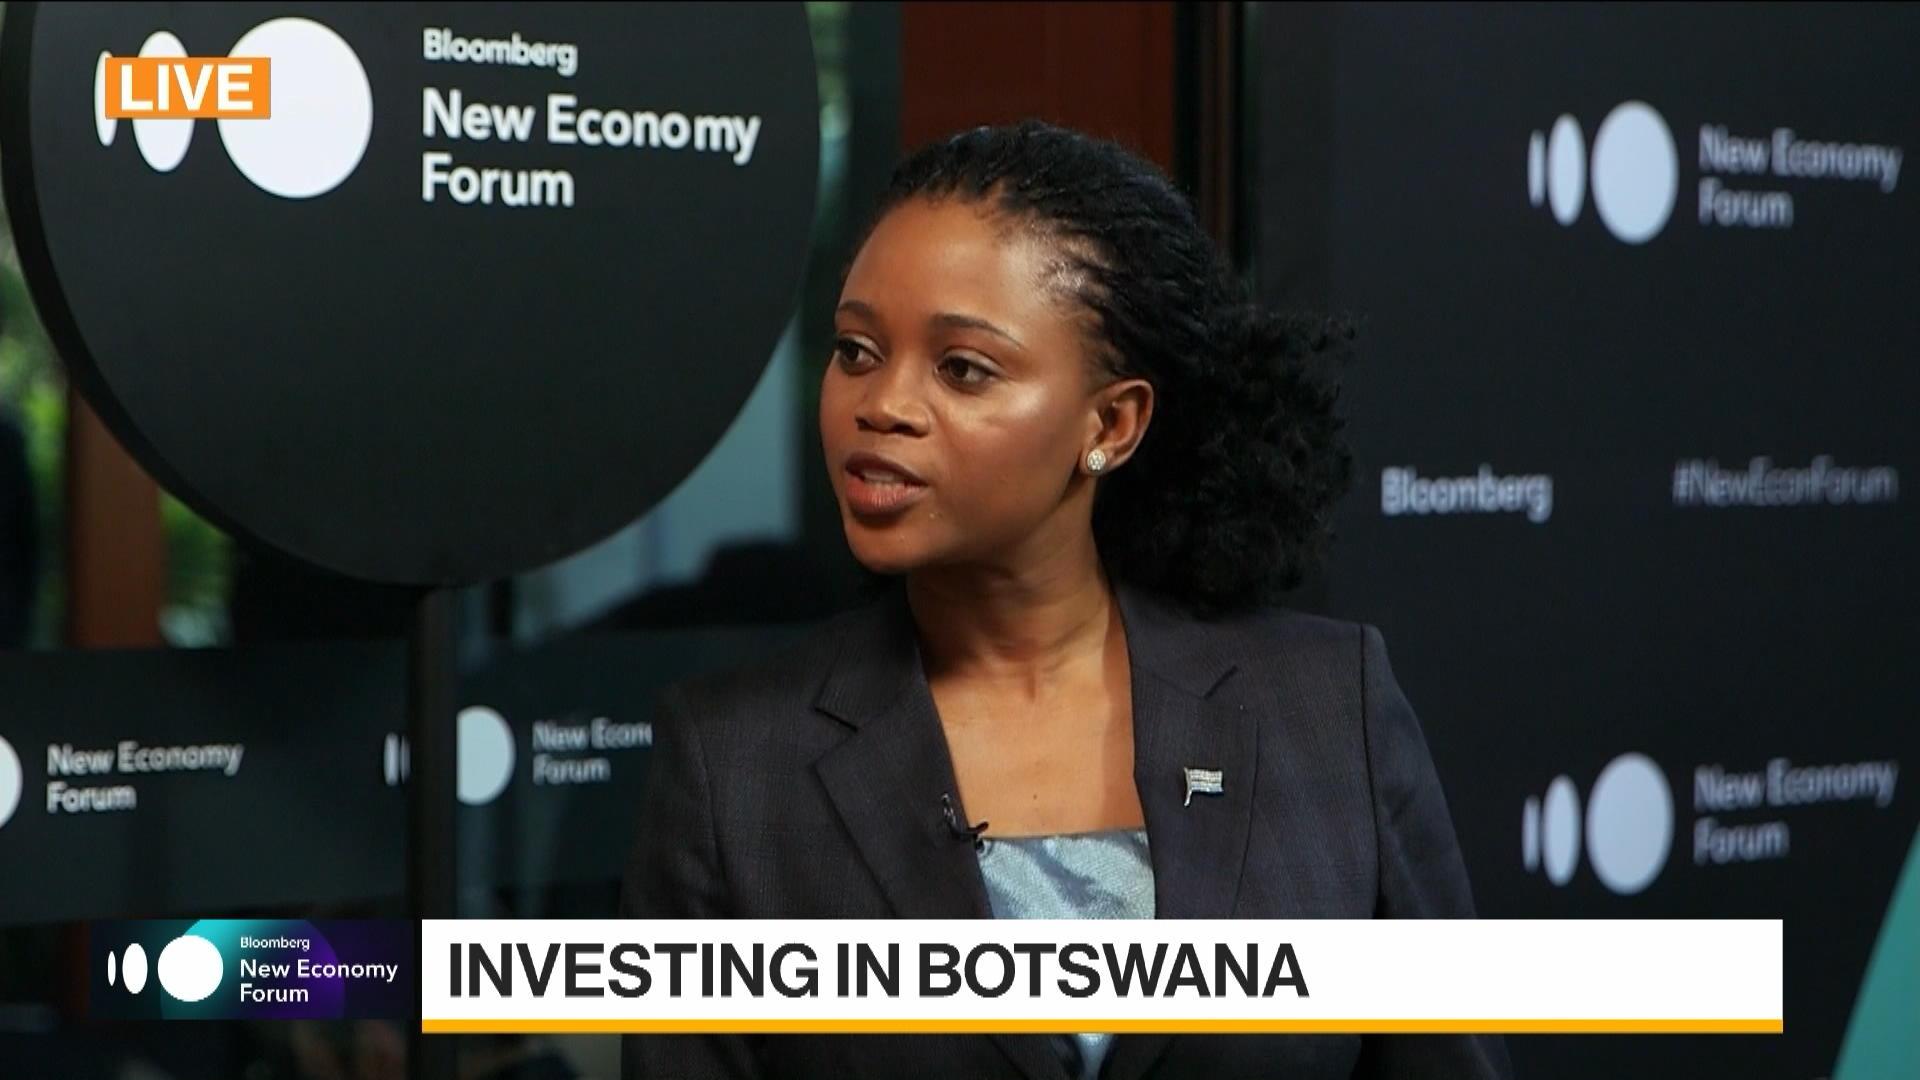 Botswana Seeks Win-Win Relationship With China, Minister Kenewendo Says